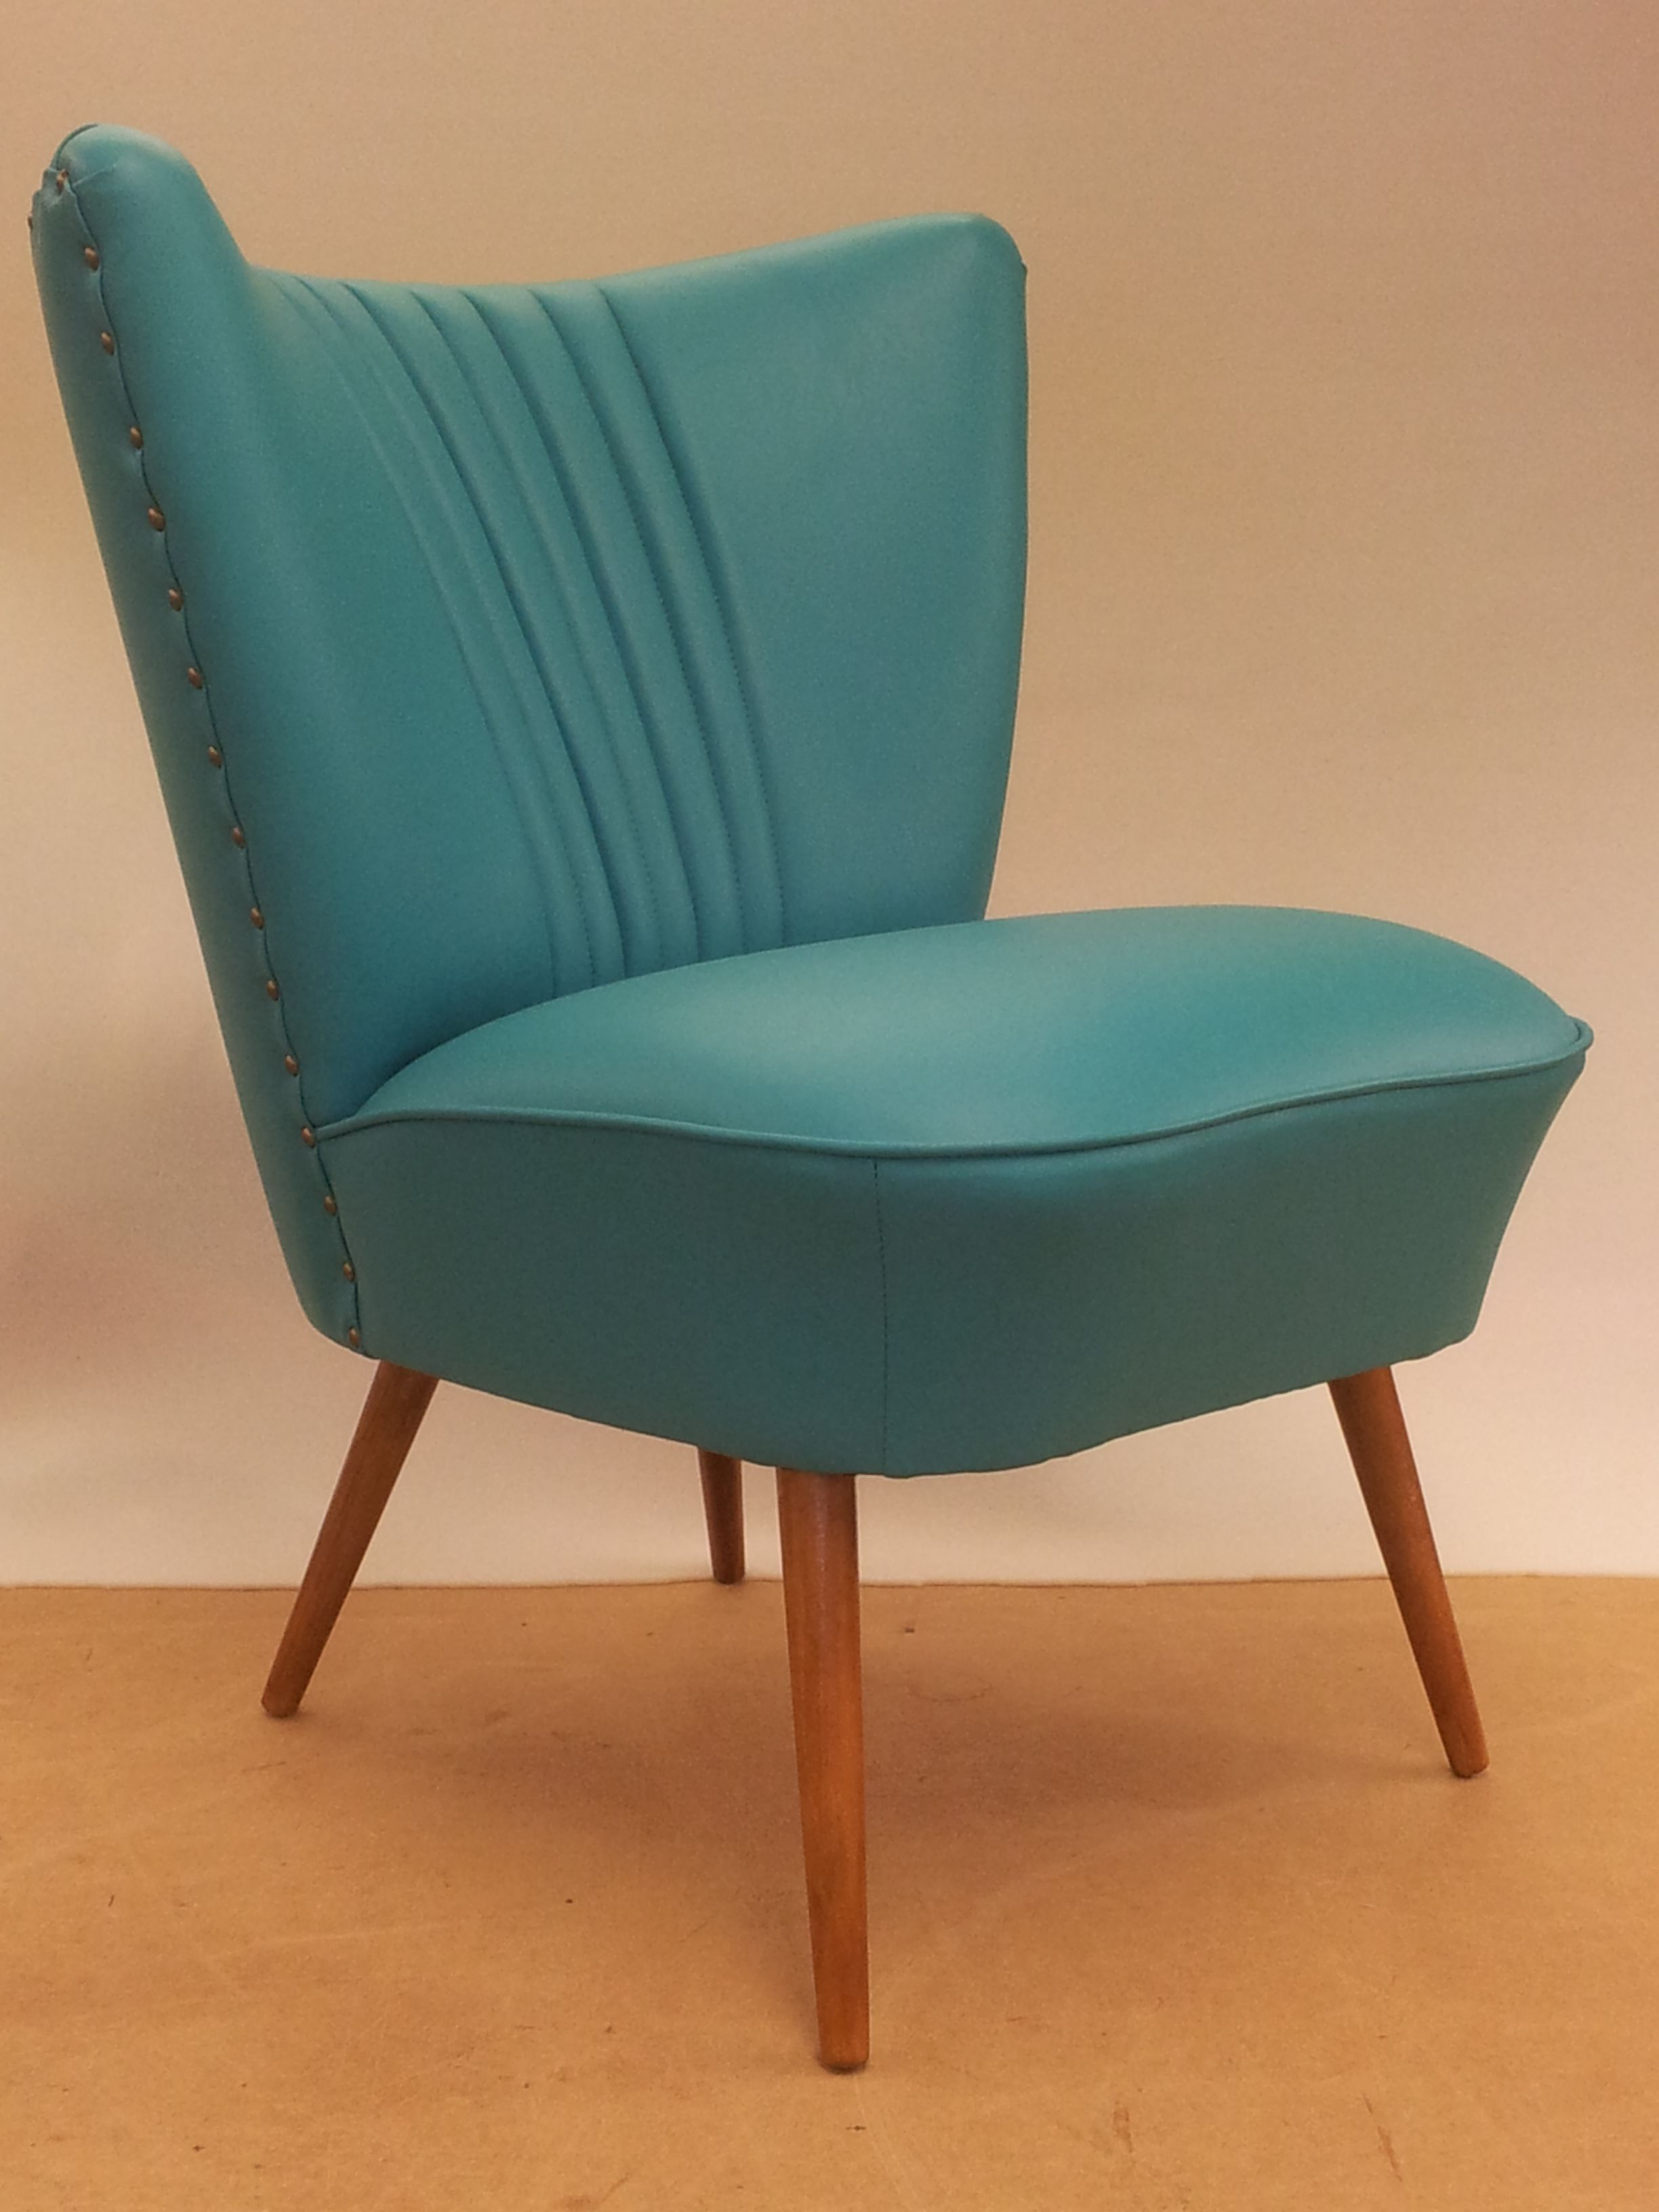 Cocktail chair blue chair blue velvet chairs cocktail